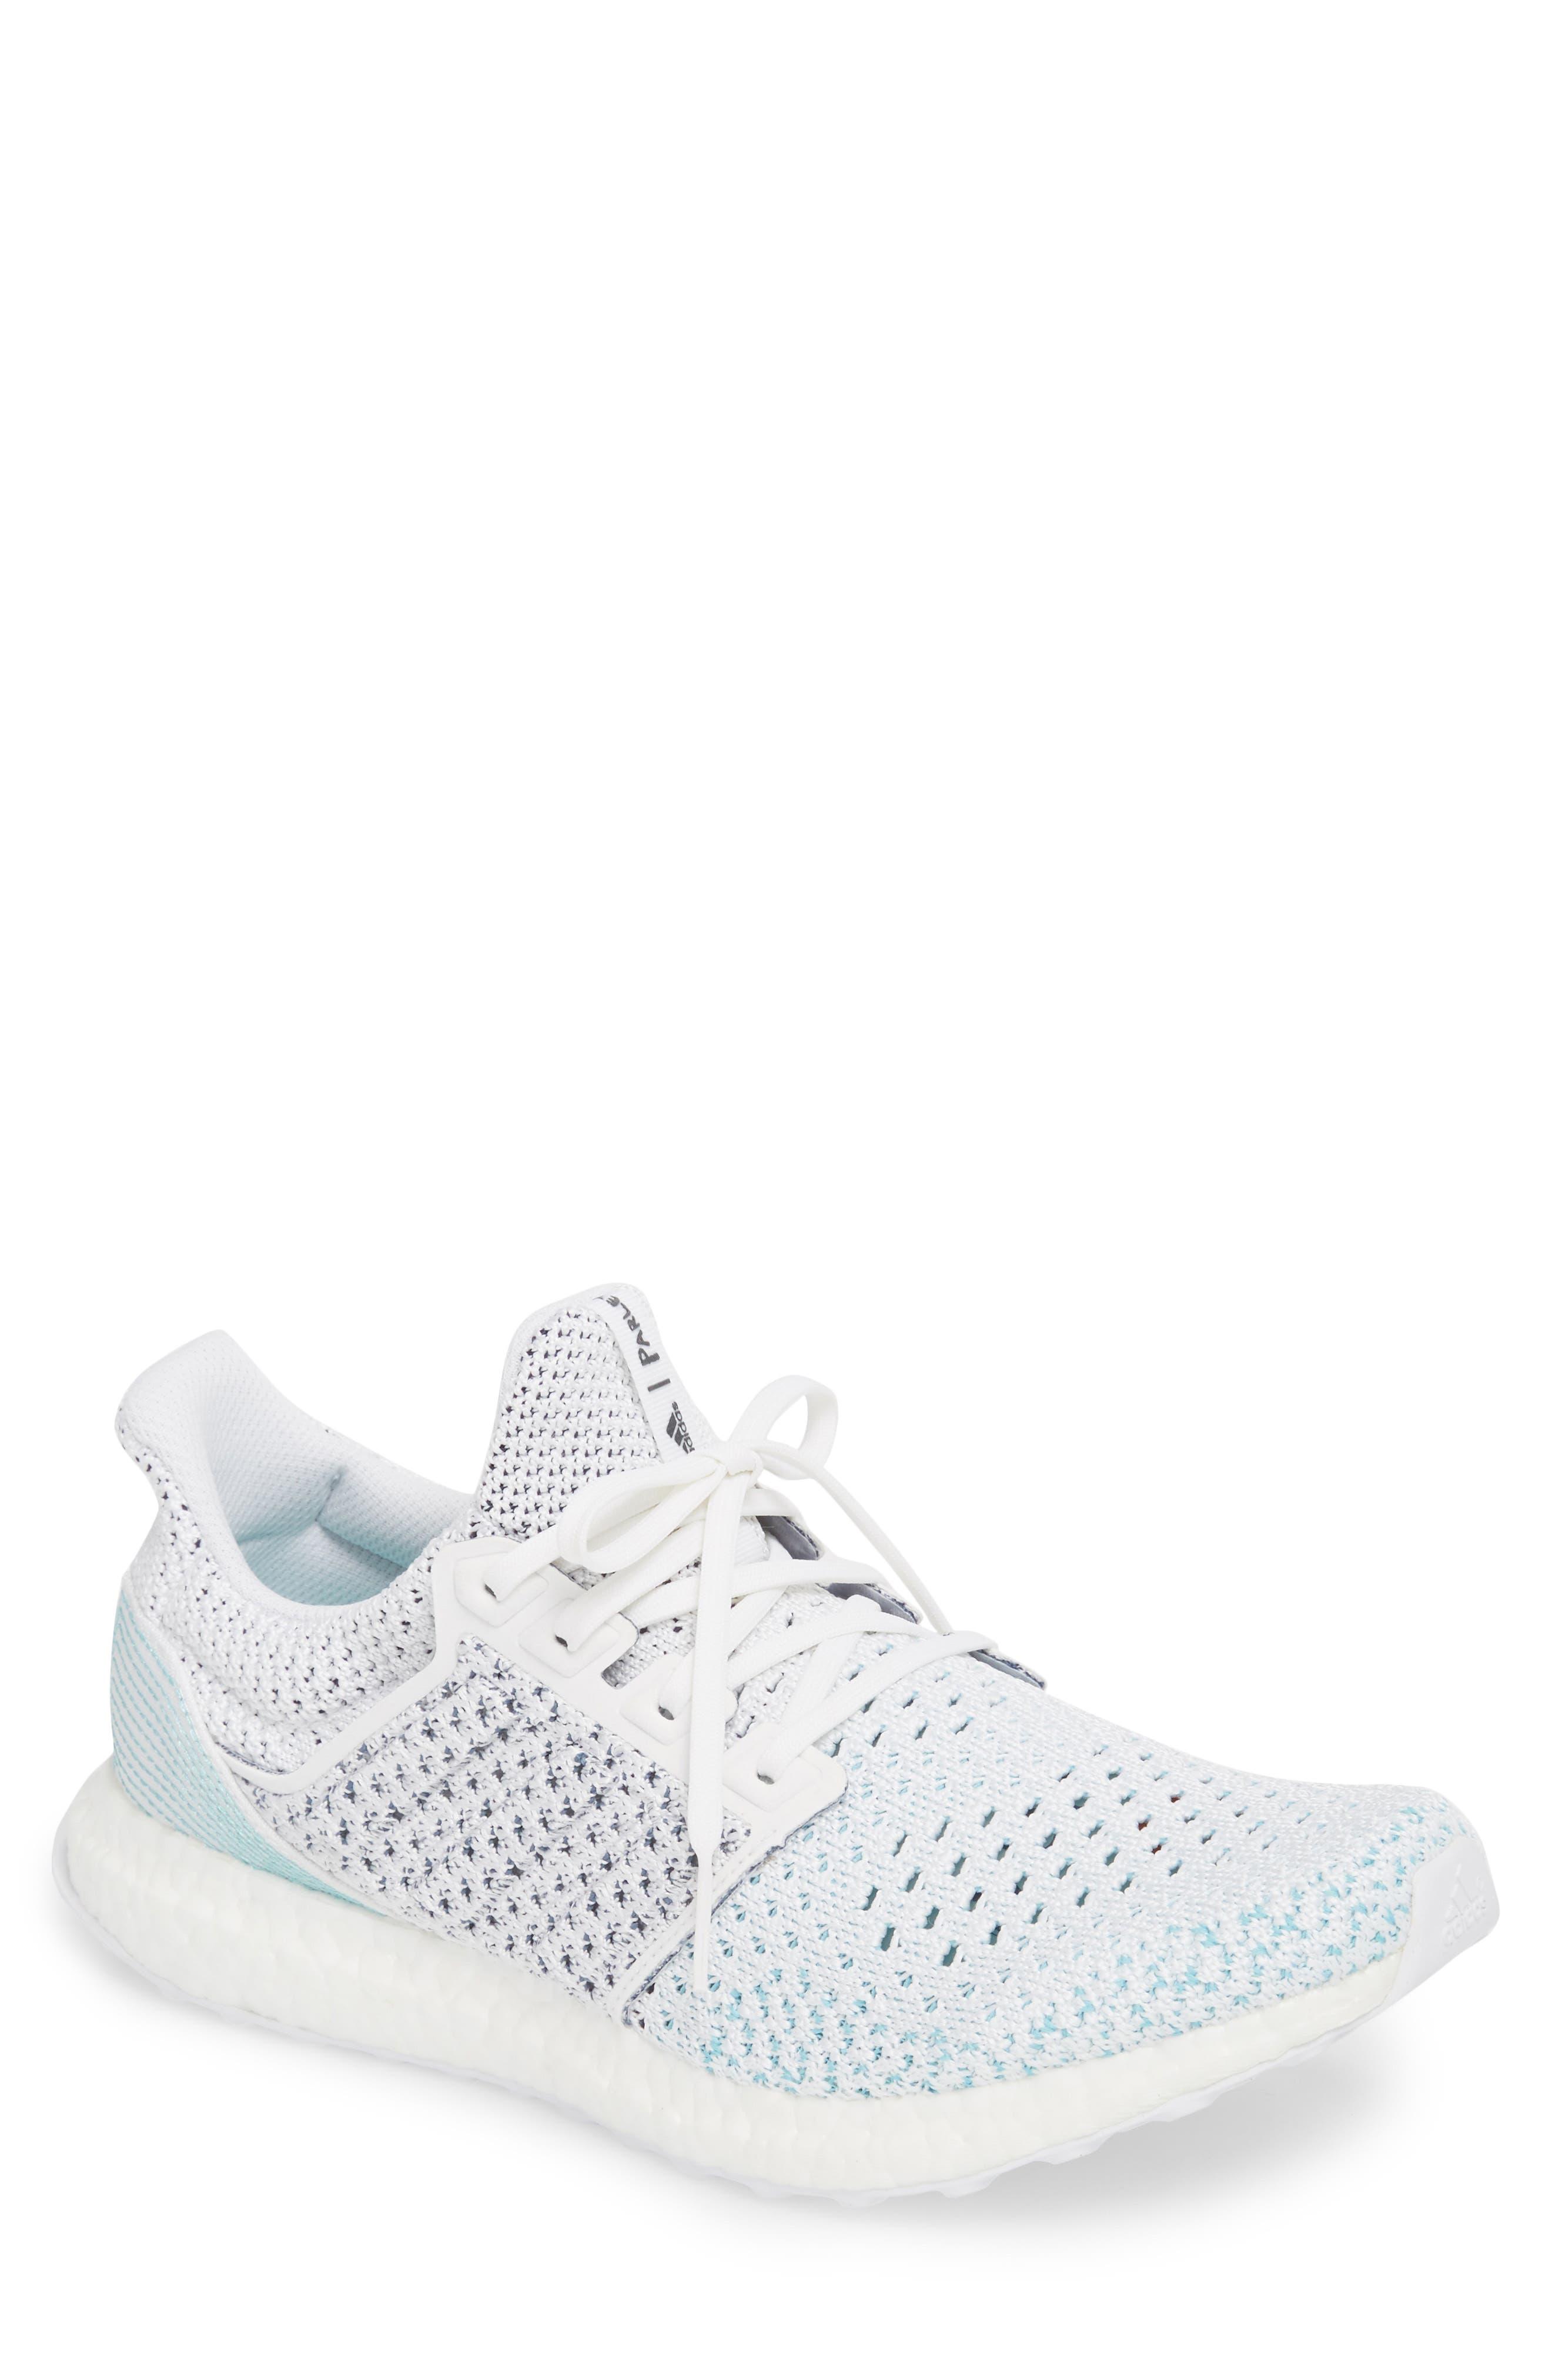 Parley UltraBoost Sneaker,                         Main,                         color, WHITE/ BLUE SPIRIT